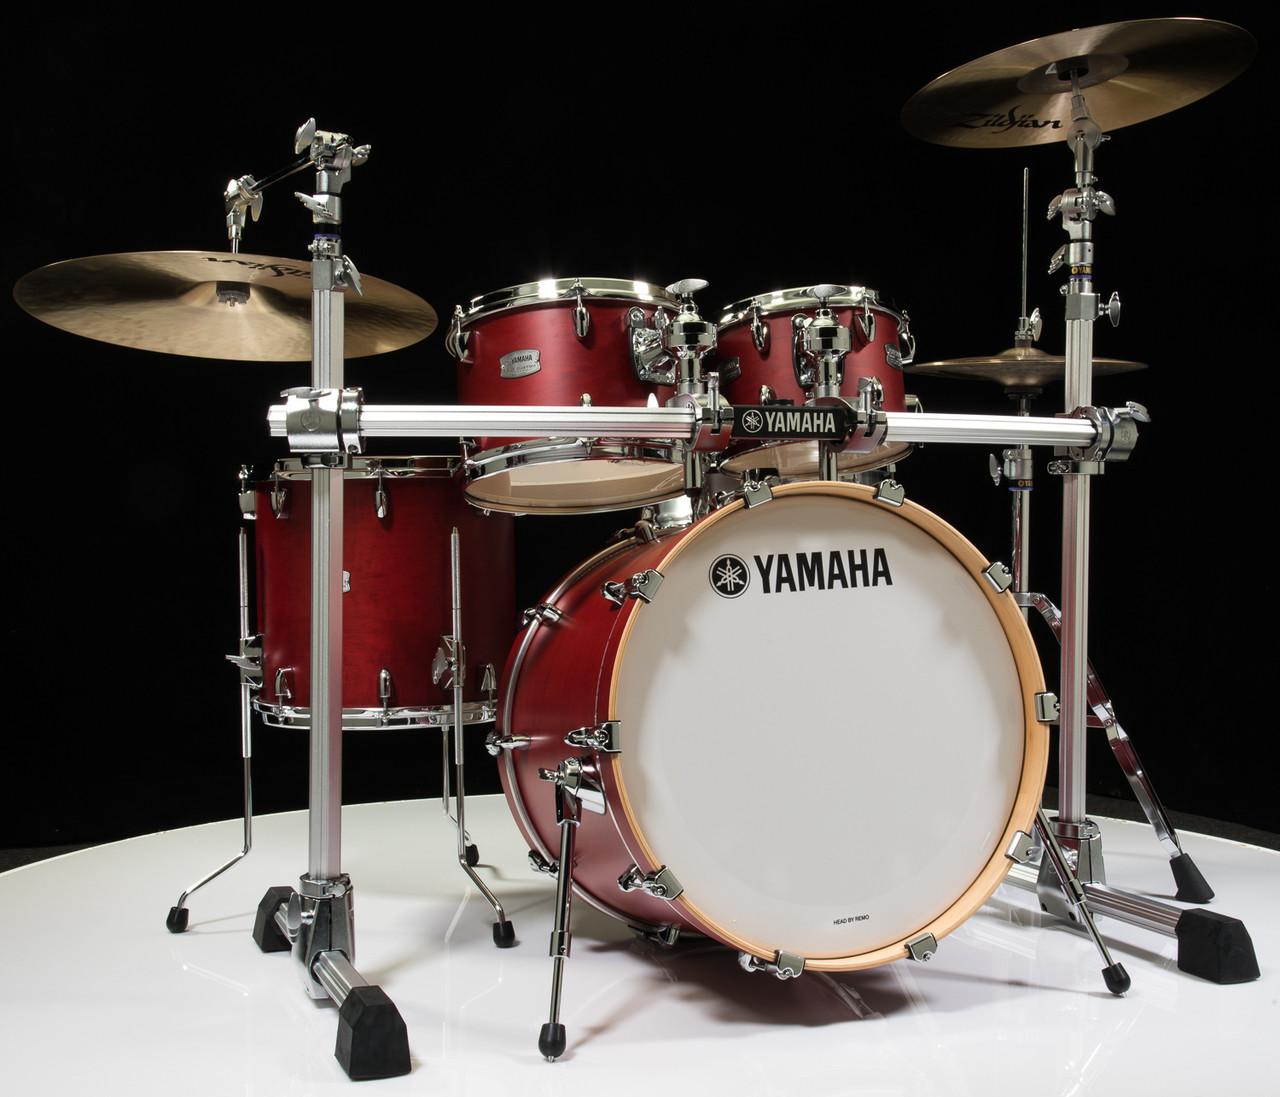 yamaha tour custom 4pc shell pack 10 12 14 20 candy apple. Black Bedroom Furniture Sets. Home Design Ideas